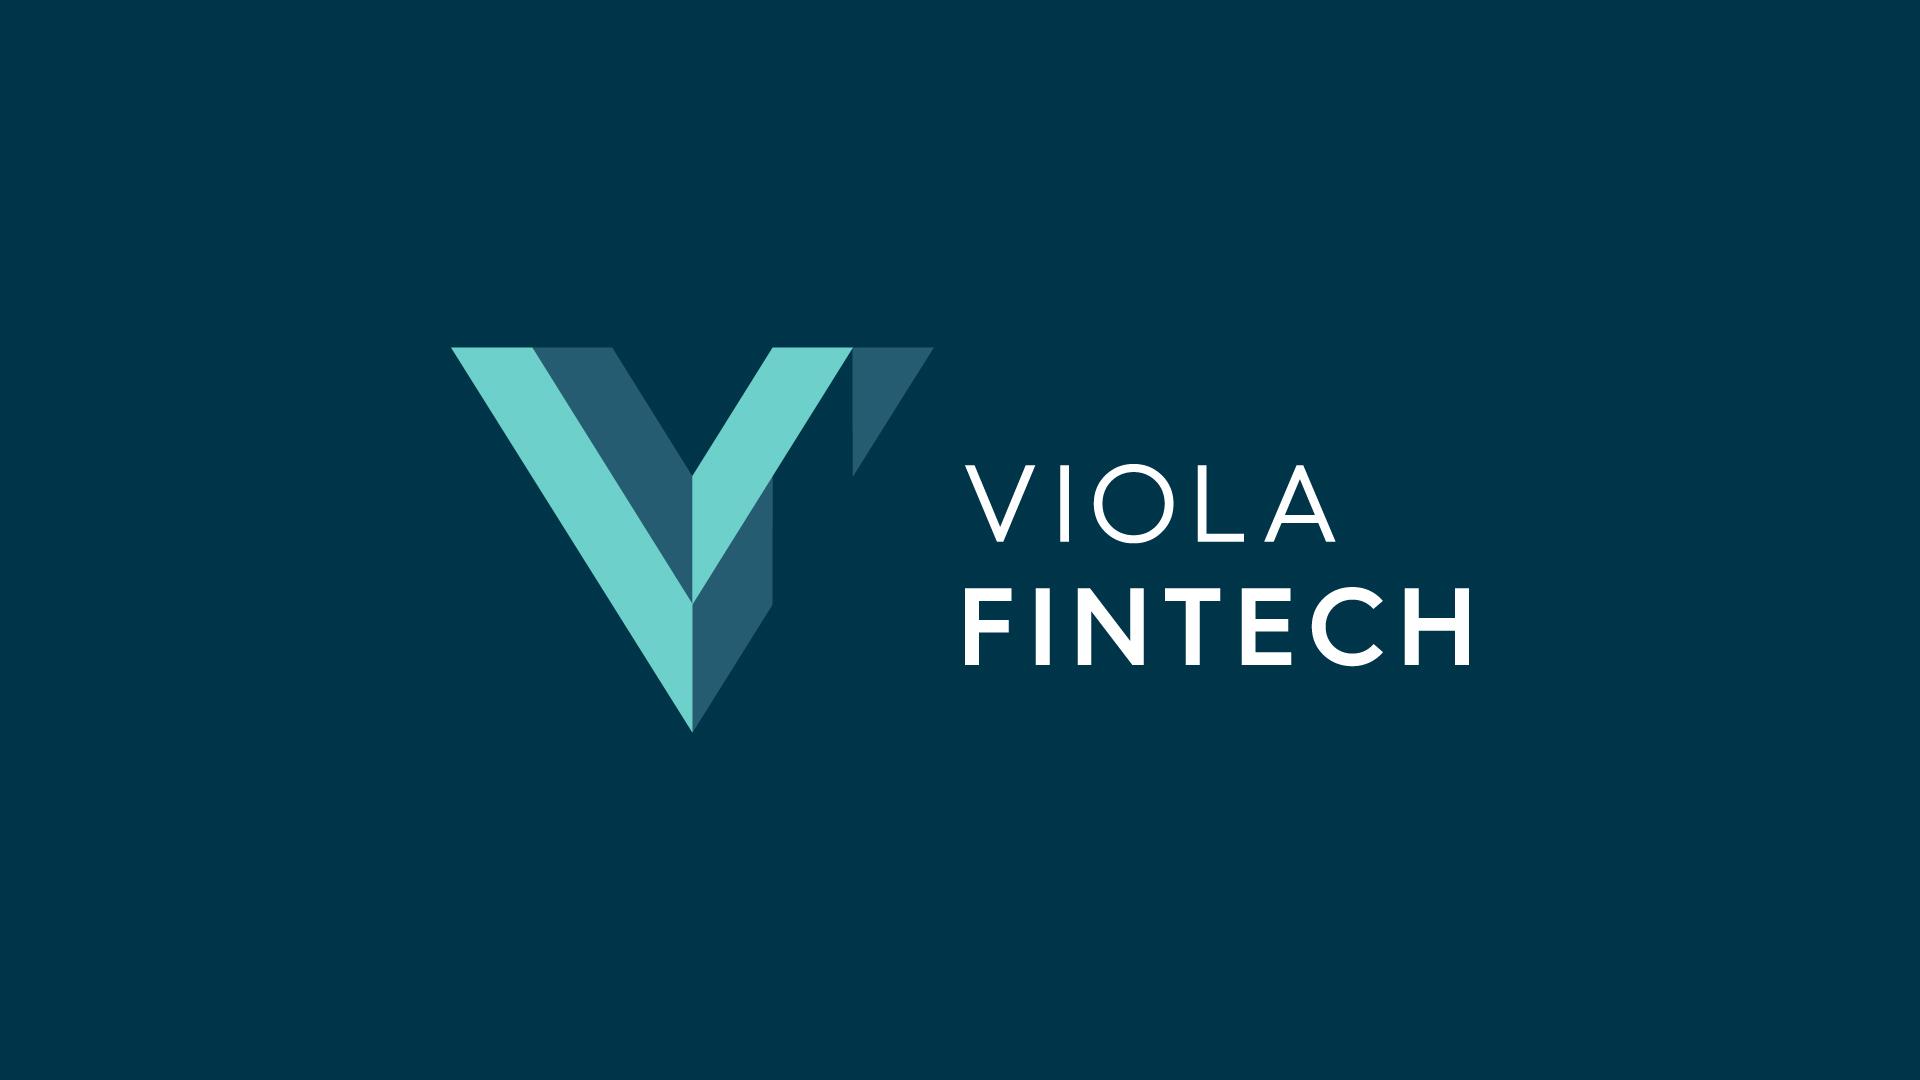 Viola Fintech